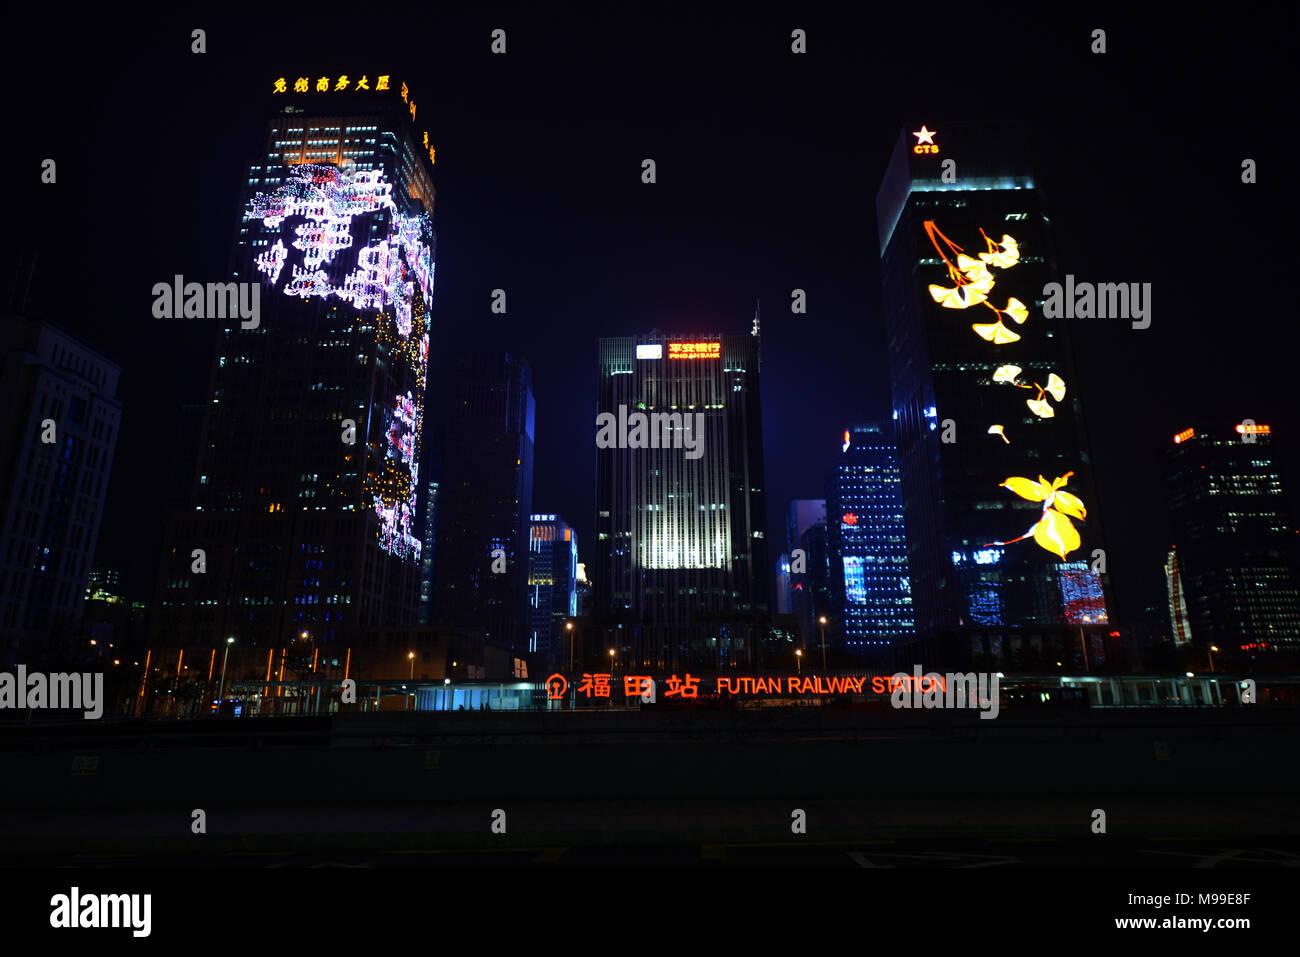 Skyscrapers in Futian district at night. - Stock Image